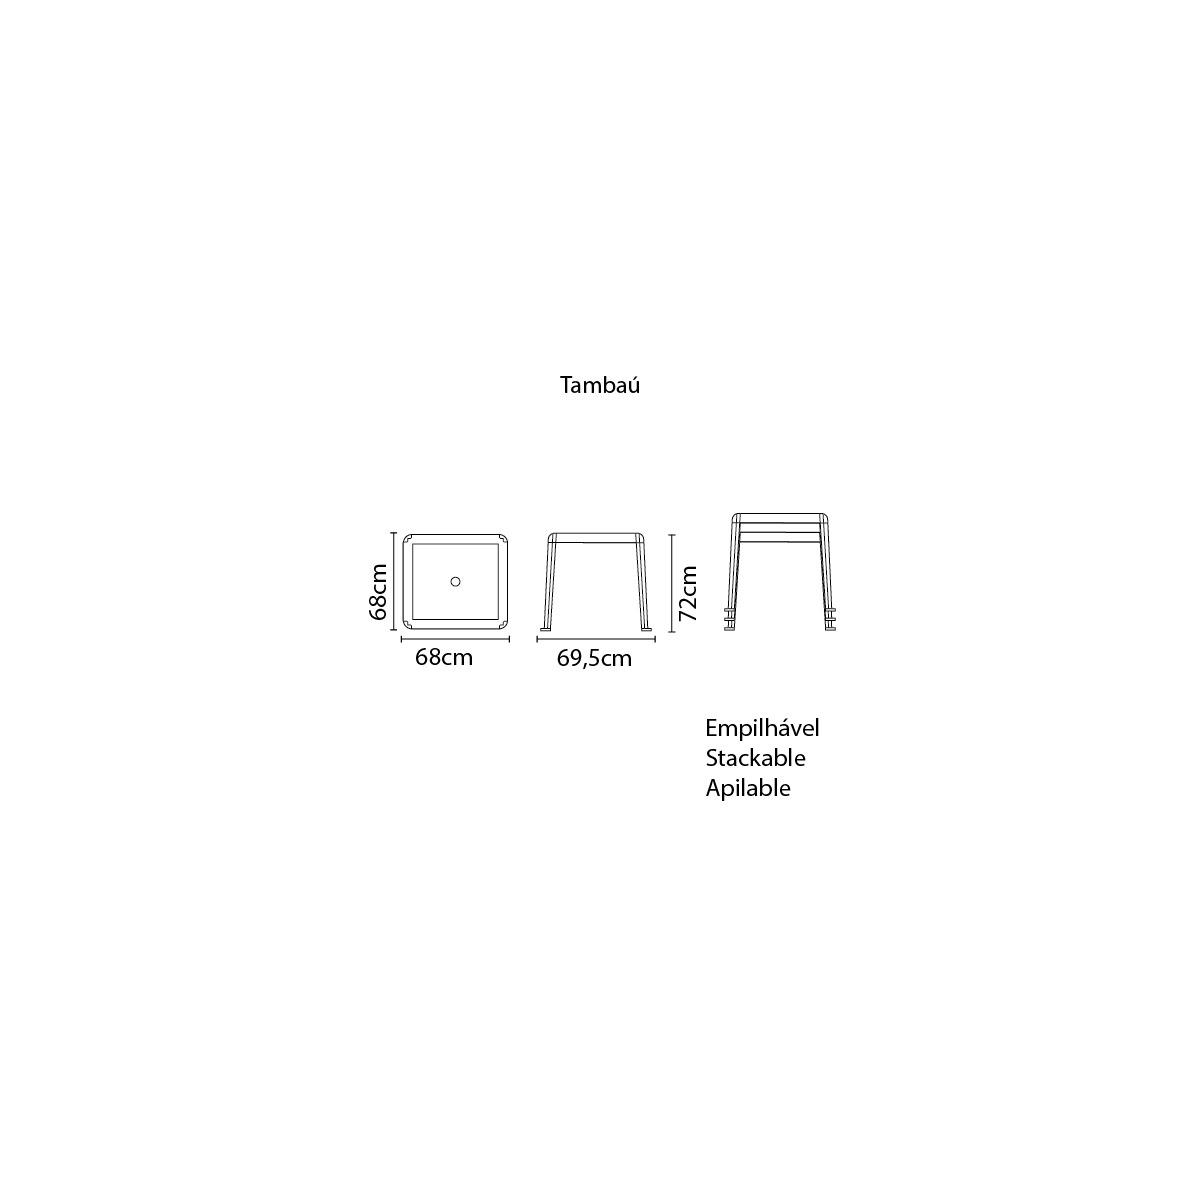 Mesa Quadrada Tramontina Tambau Basic em Polipropileno Branco